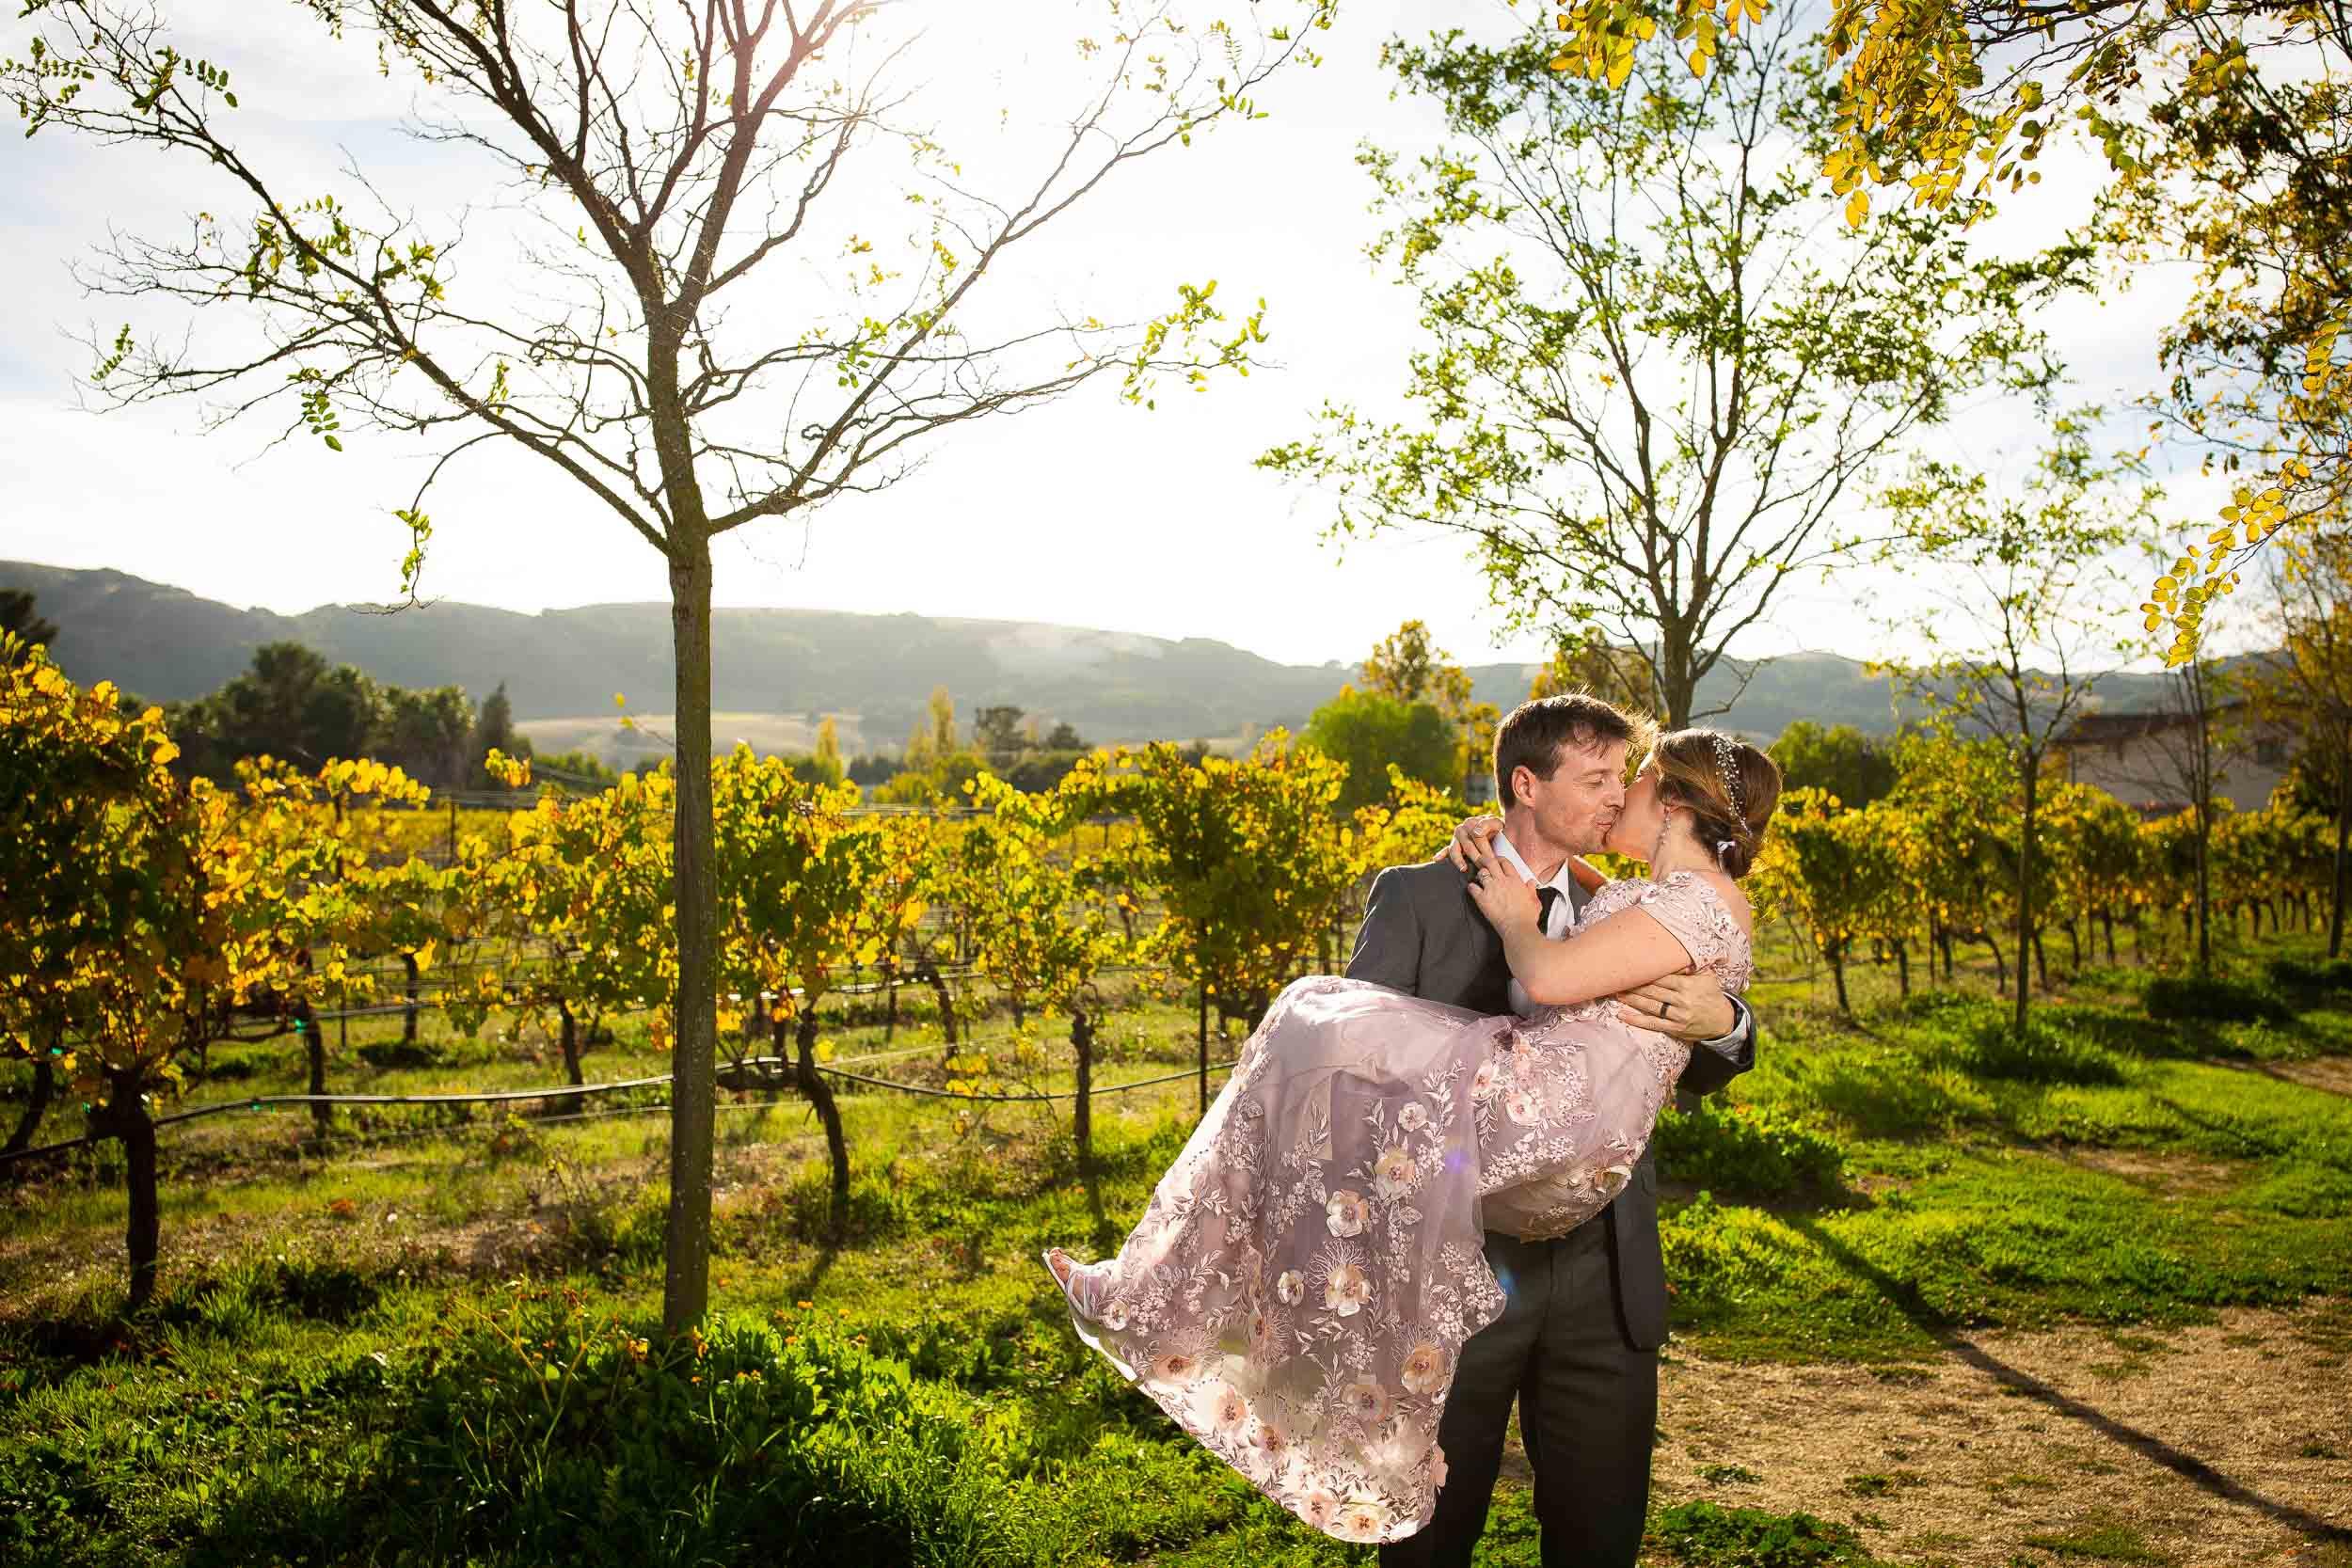 Jacuzzi Family Vineyards Wedding Photos-12.jpg